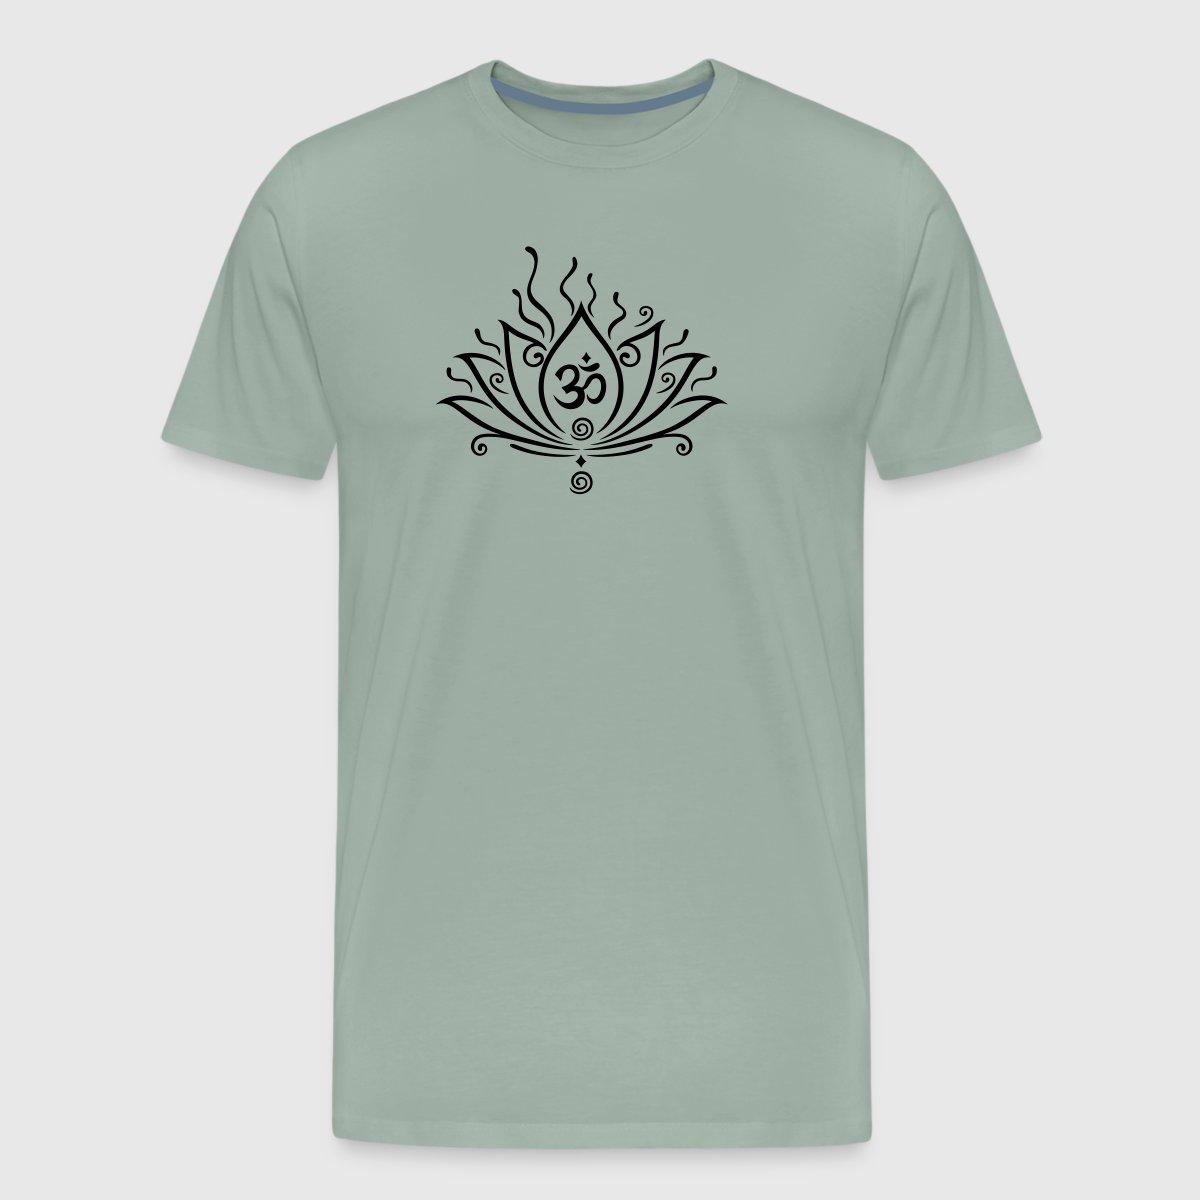 Lotus Flower Yoga With Om Symbol By Christine Krahl Spreadshirt